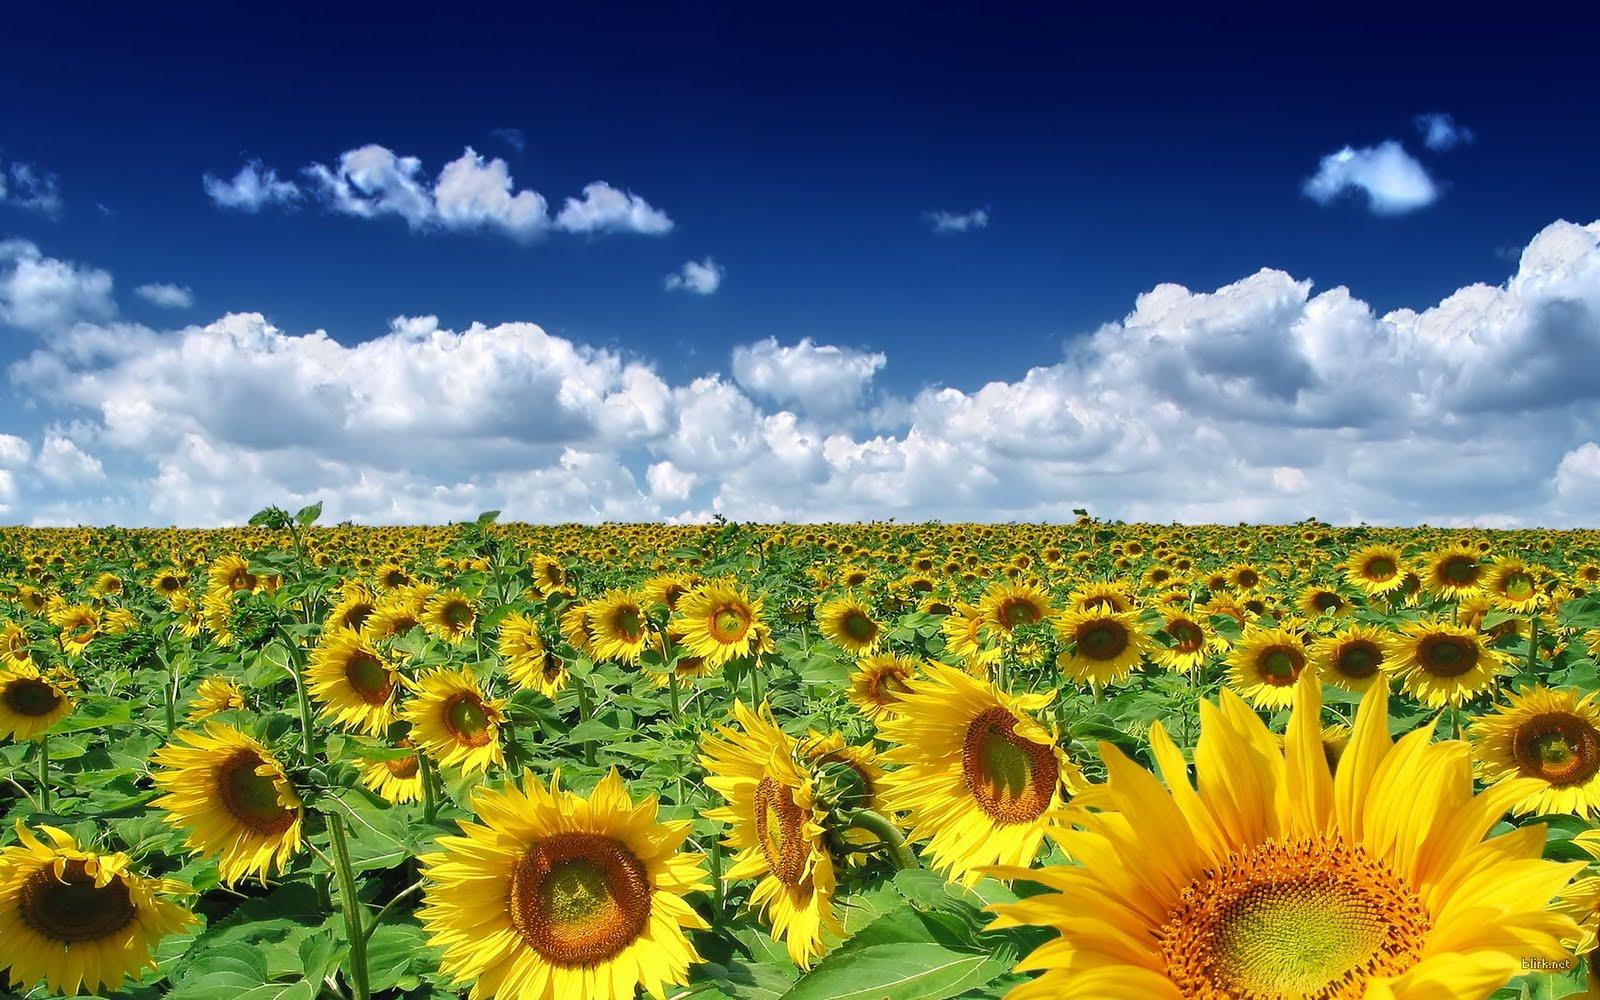 http://2.bp.blogspot.com/_YA8CmyMTHA0/TBQCI70s8QI/AAAAAAAAAh4/xUXquZ3c5ao/s1600/sunflower-001.jpg